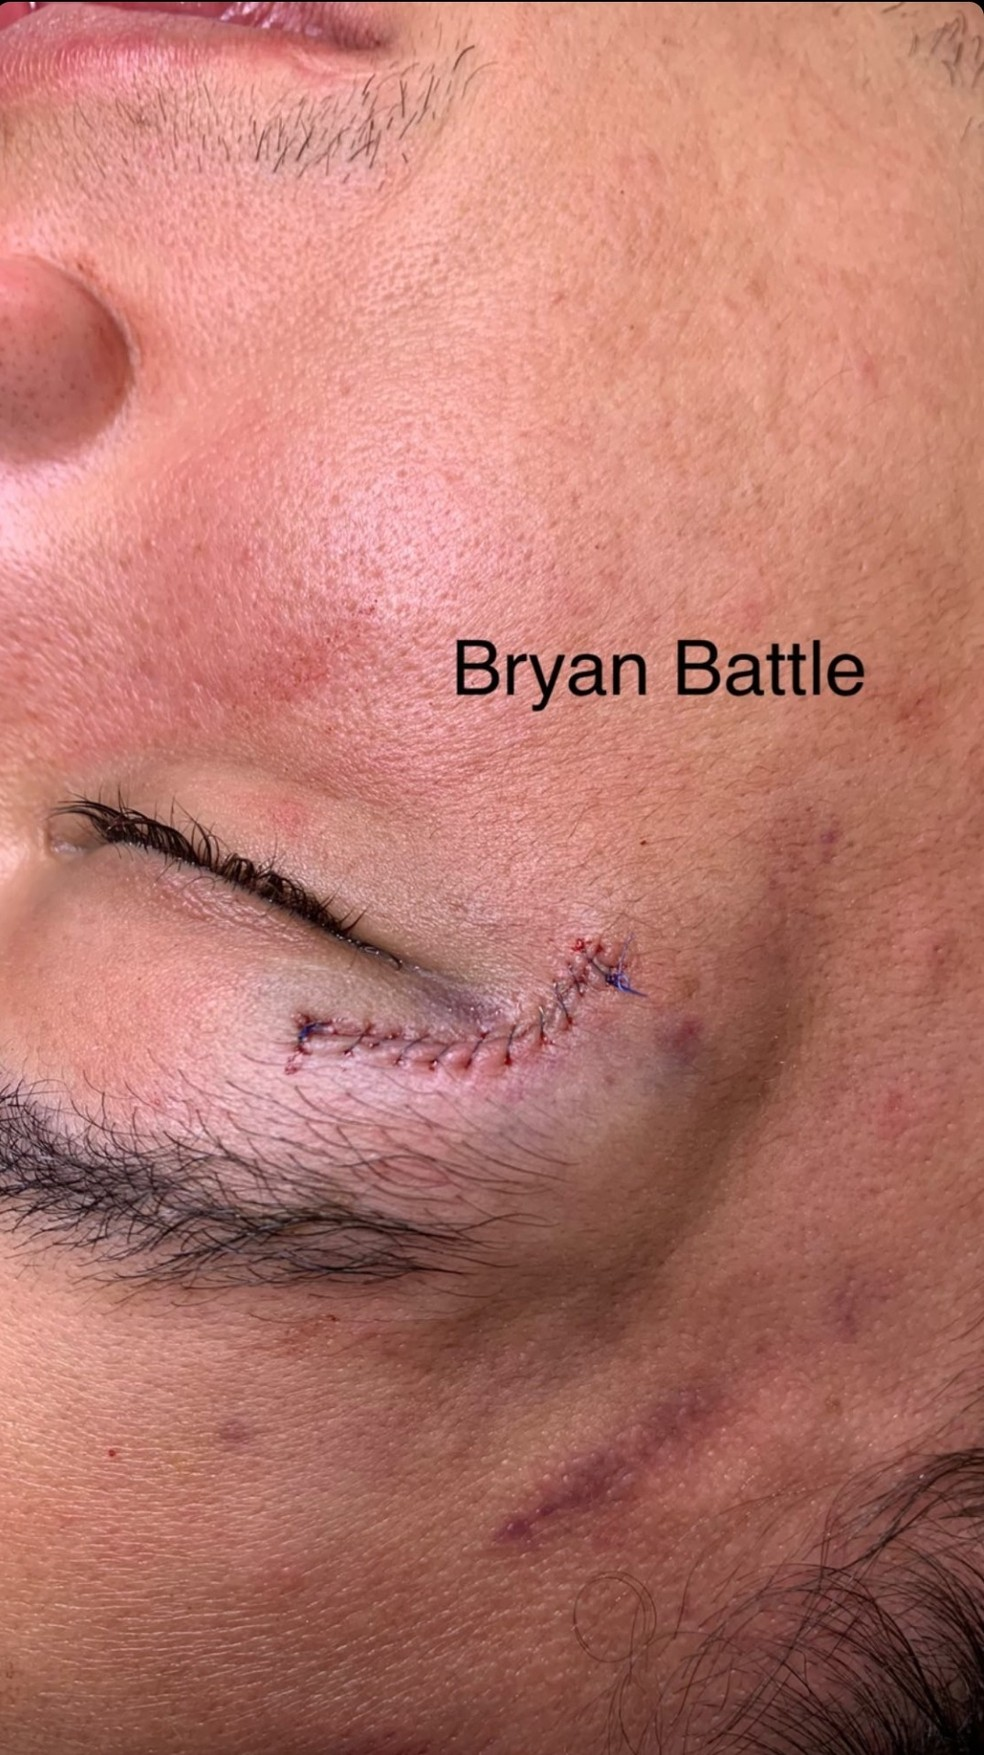 Bryan Battle depois